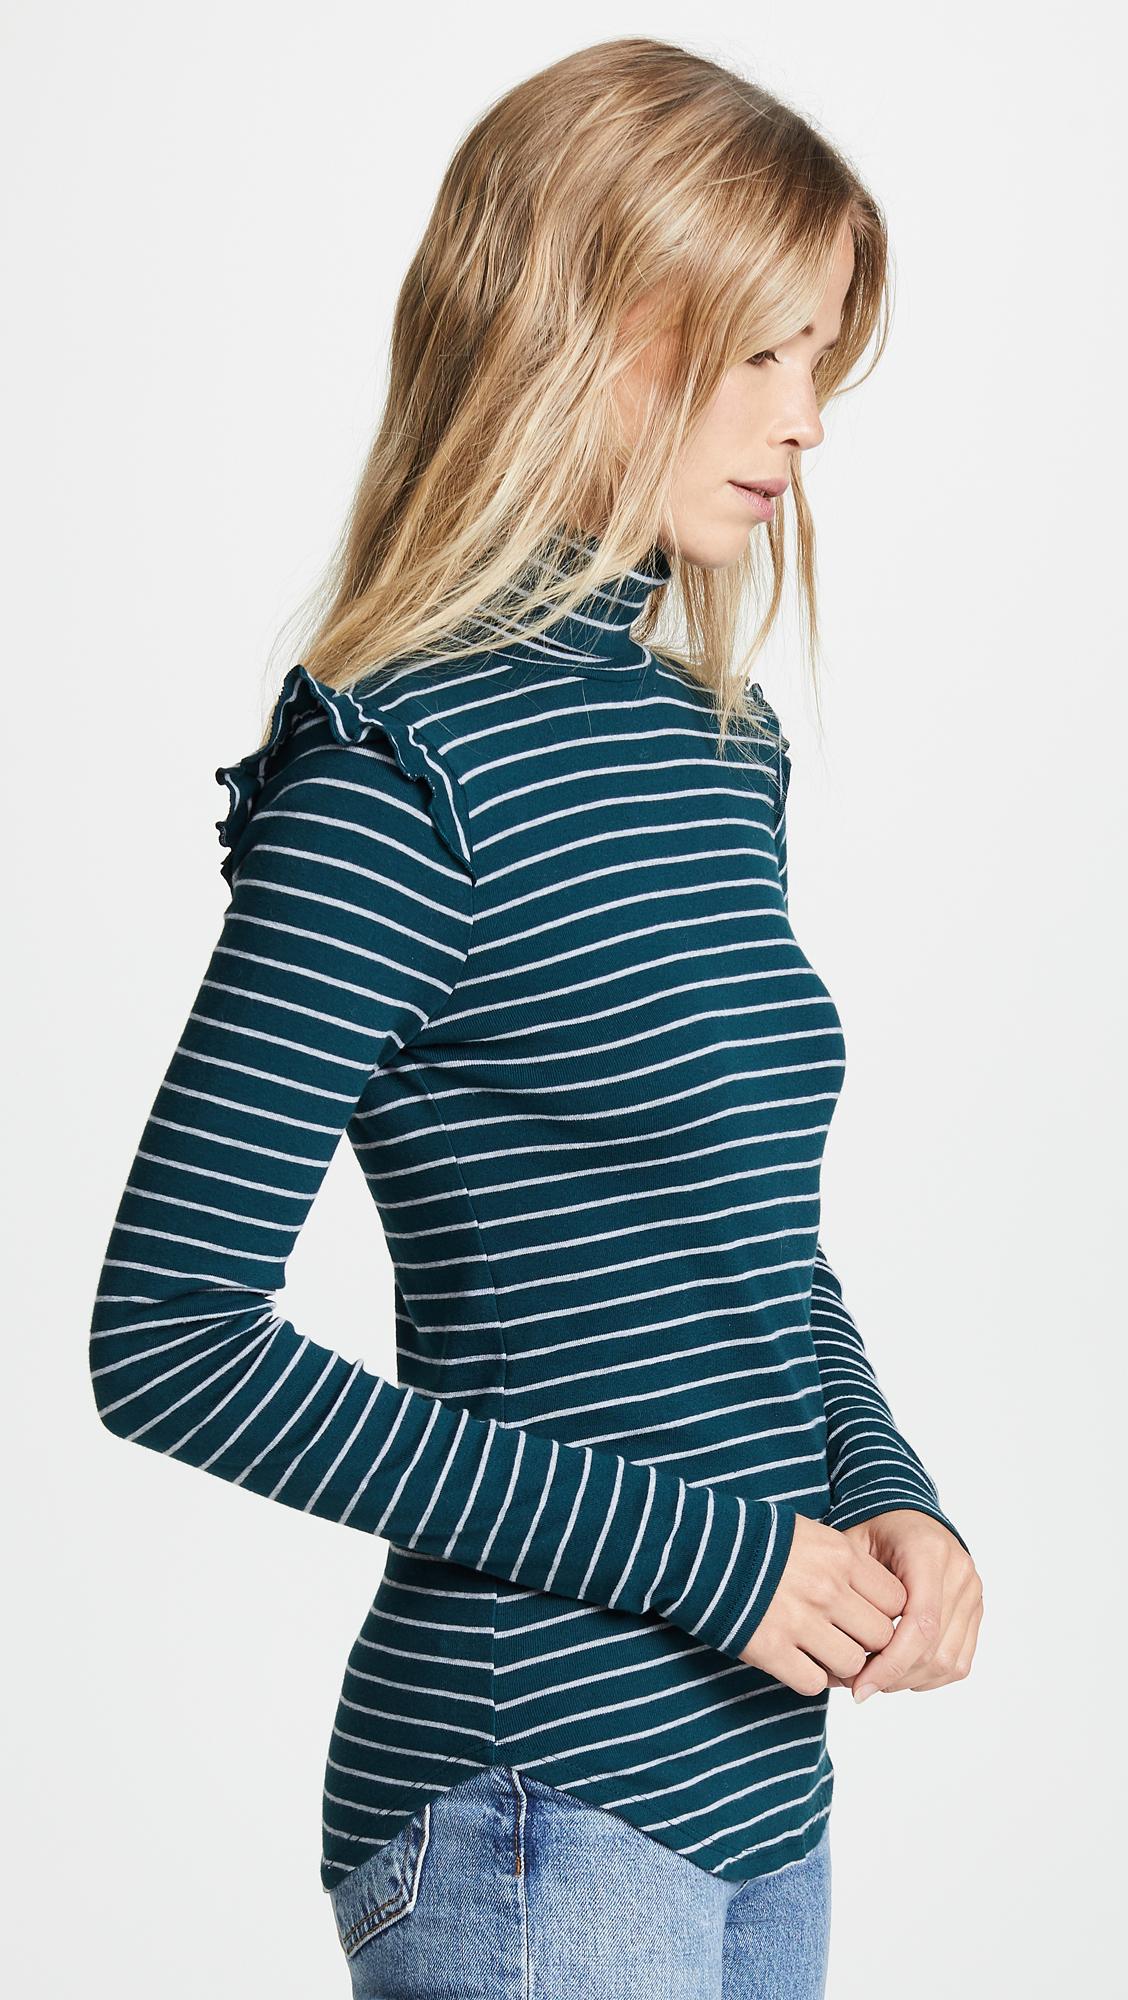 Long Sleeve Turtleneck with Ruffle Shoulder